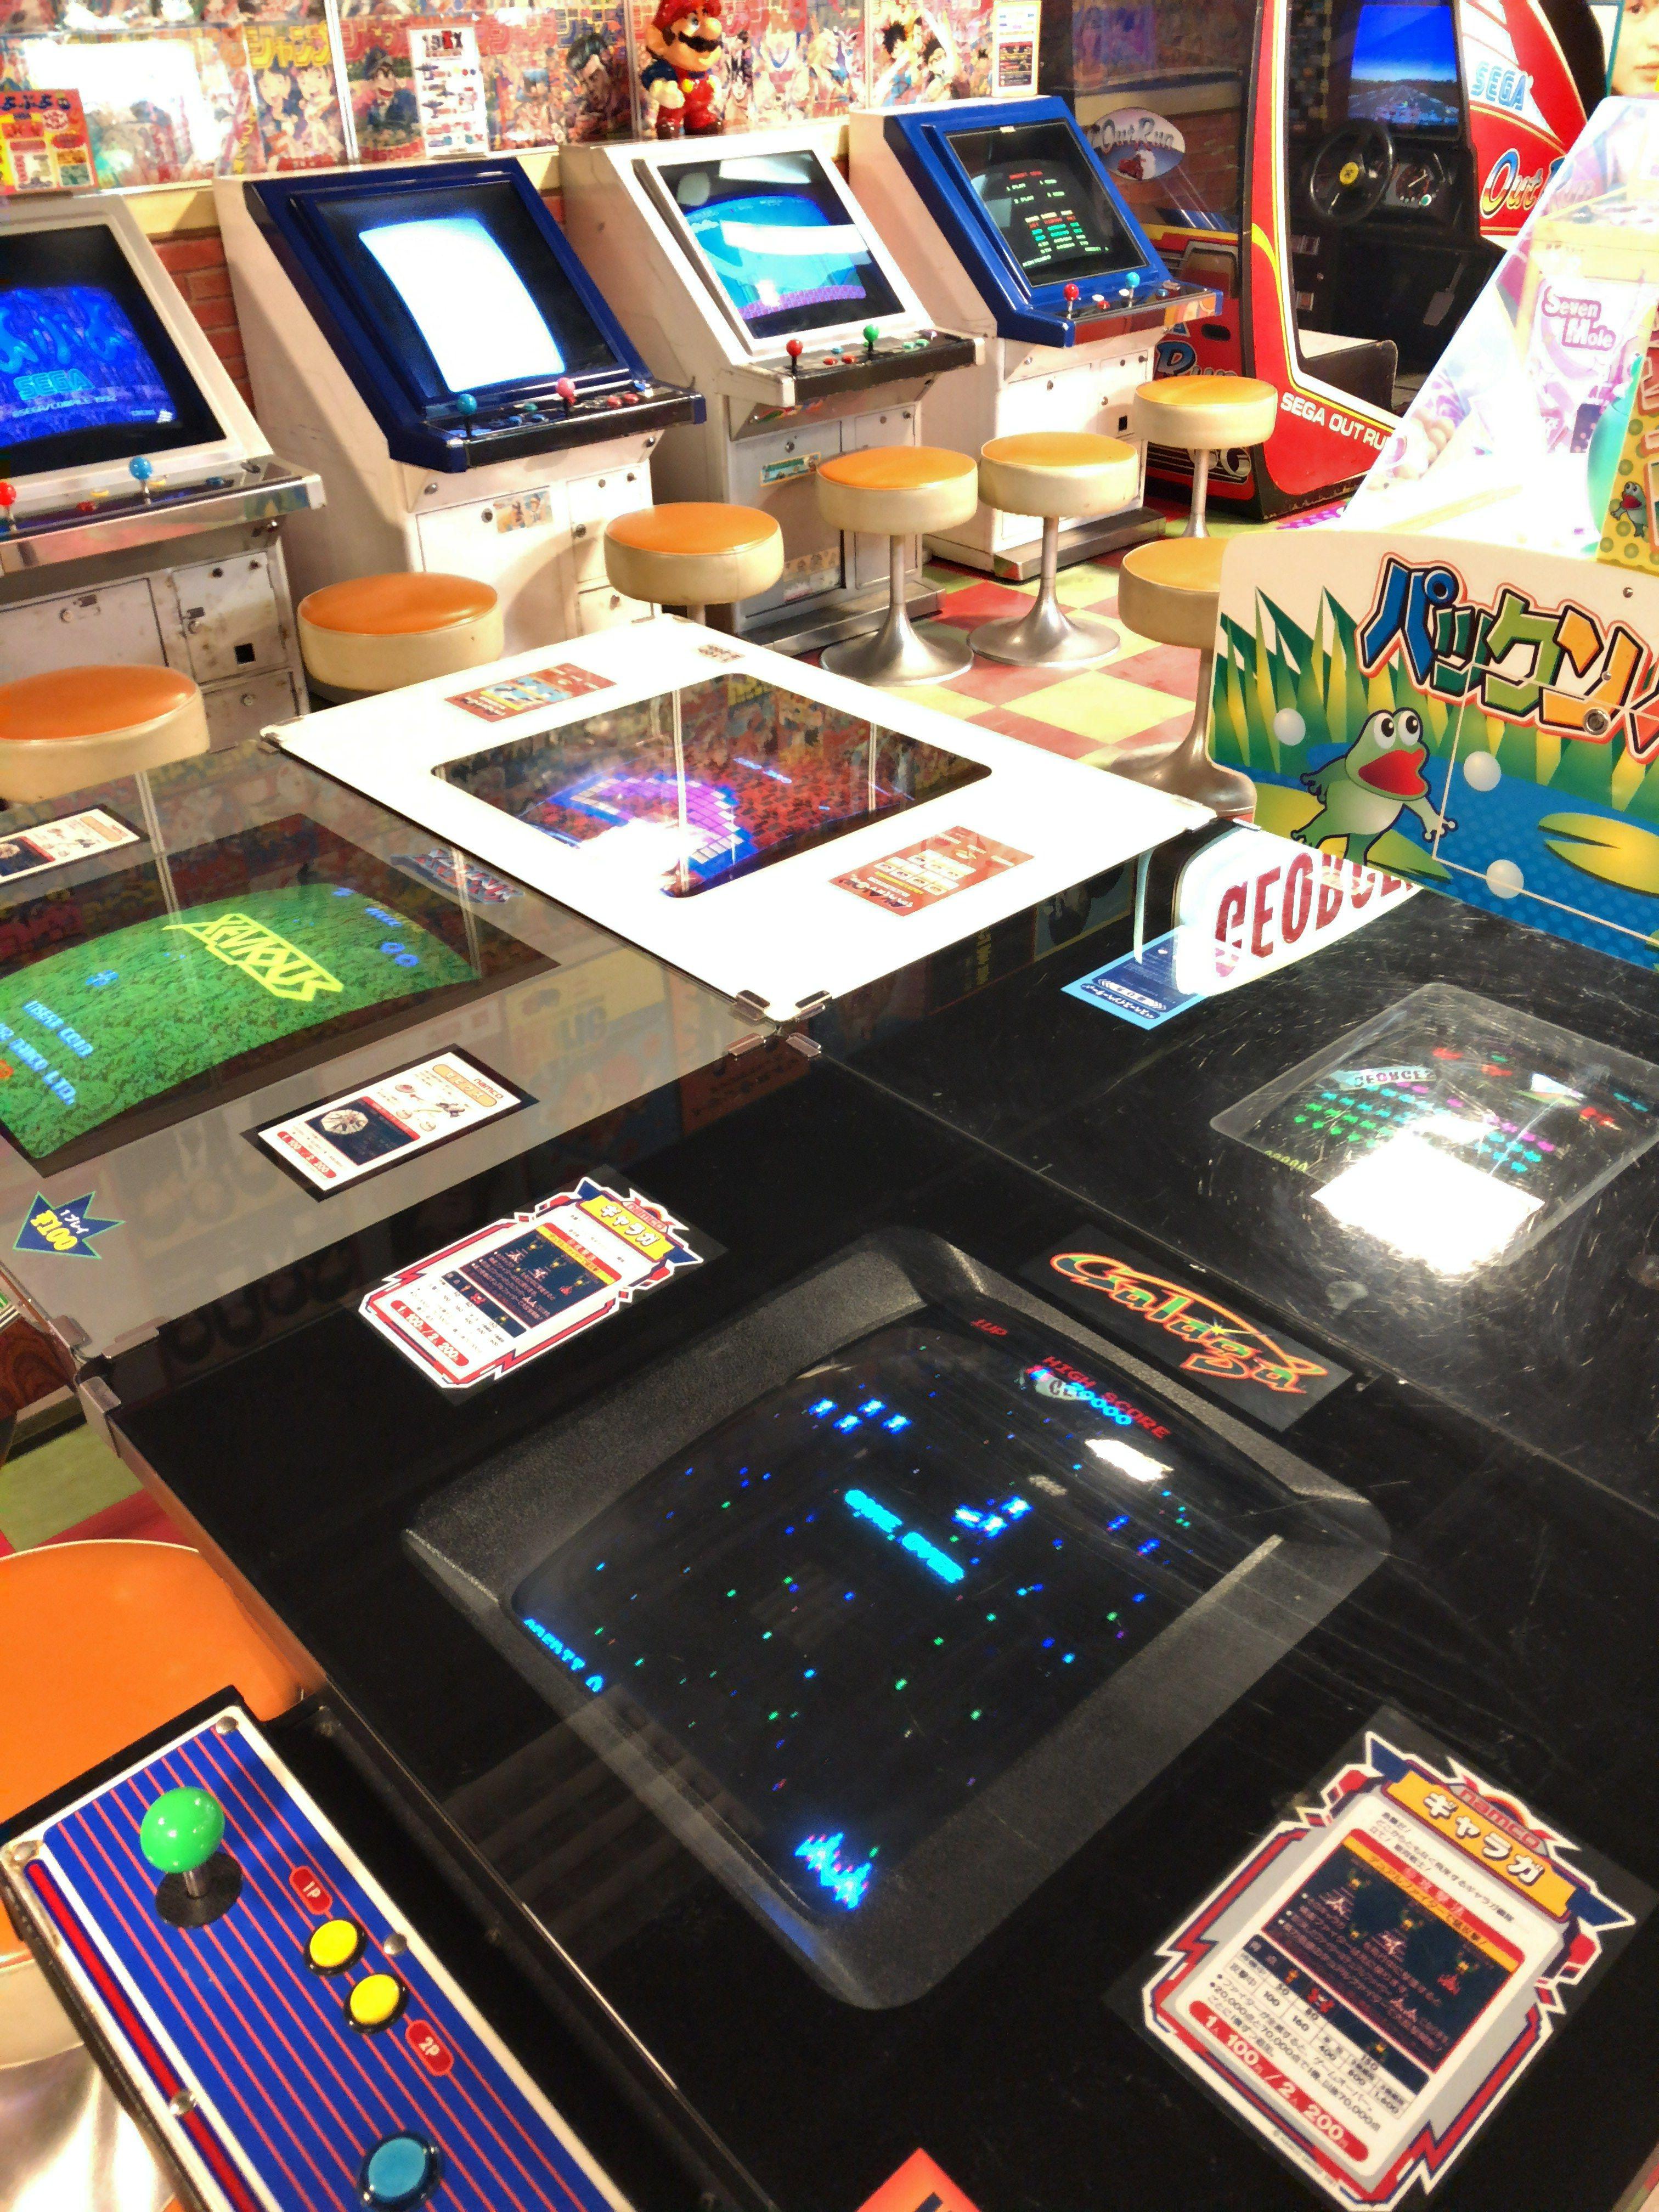 Pin by jason seymour on arcade machines Arcade, Retro